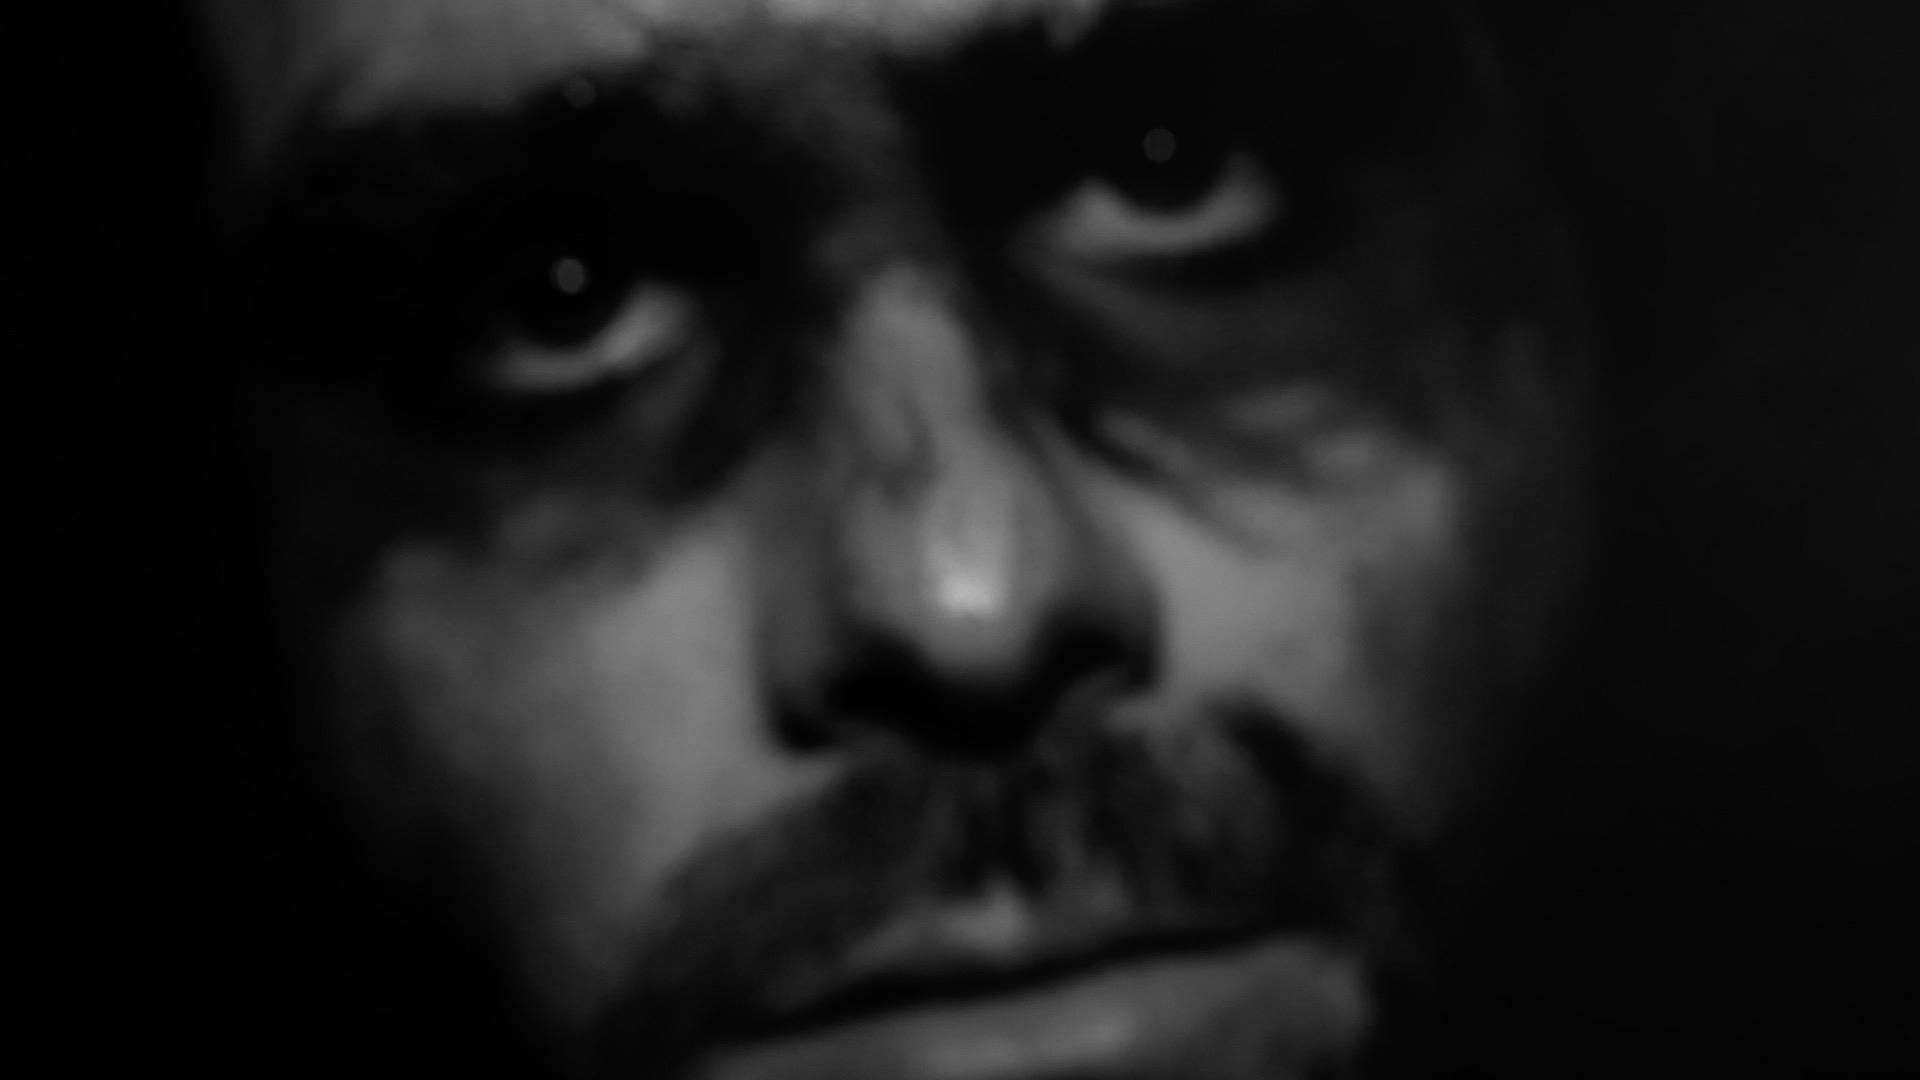 Fever-Milo-Joki-Tournage-clip-vidéo-paca-Var-realisateur-Riberaigua-producteur-36